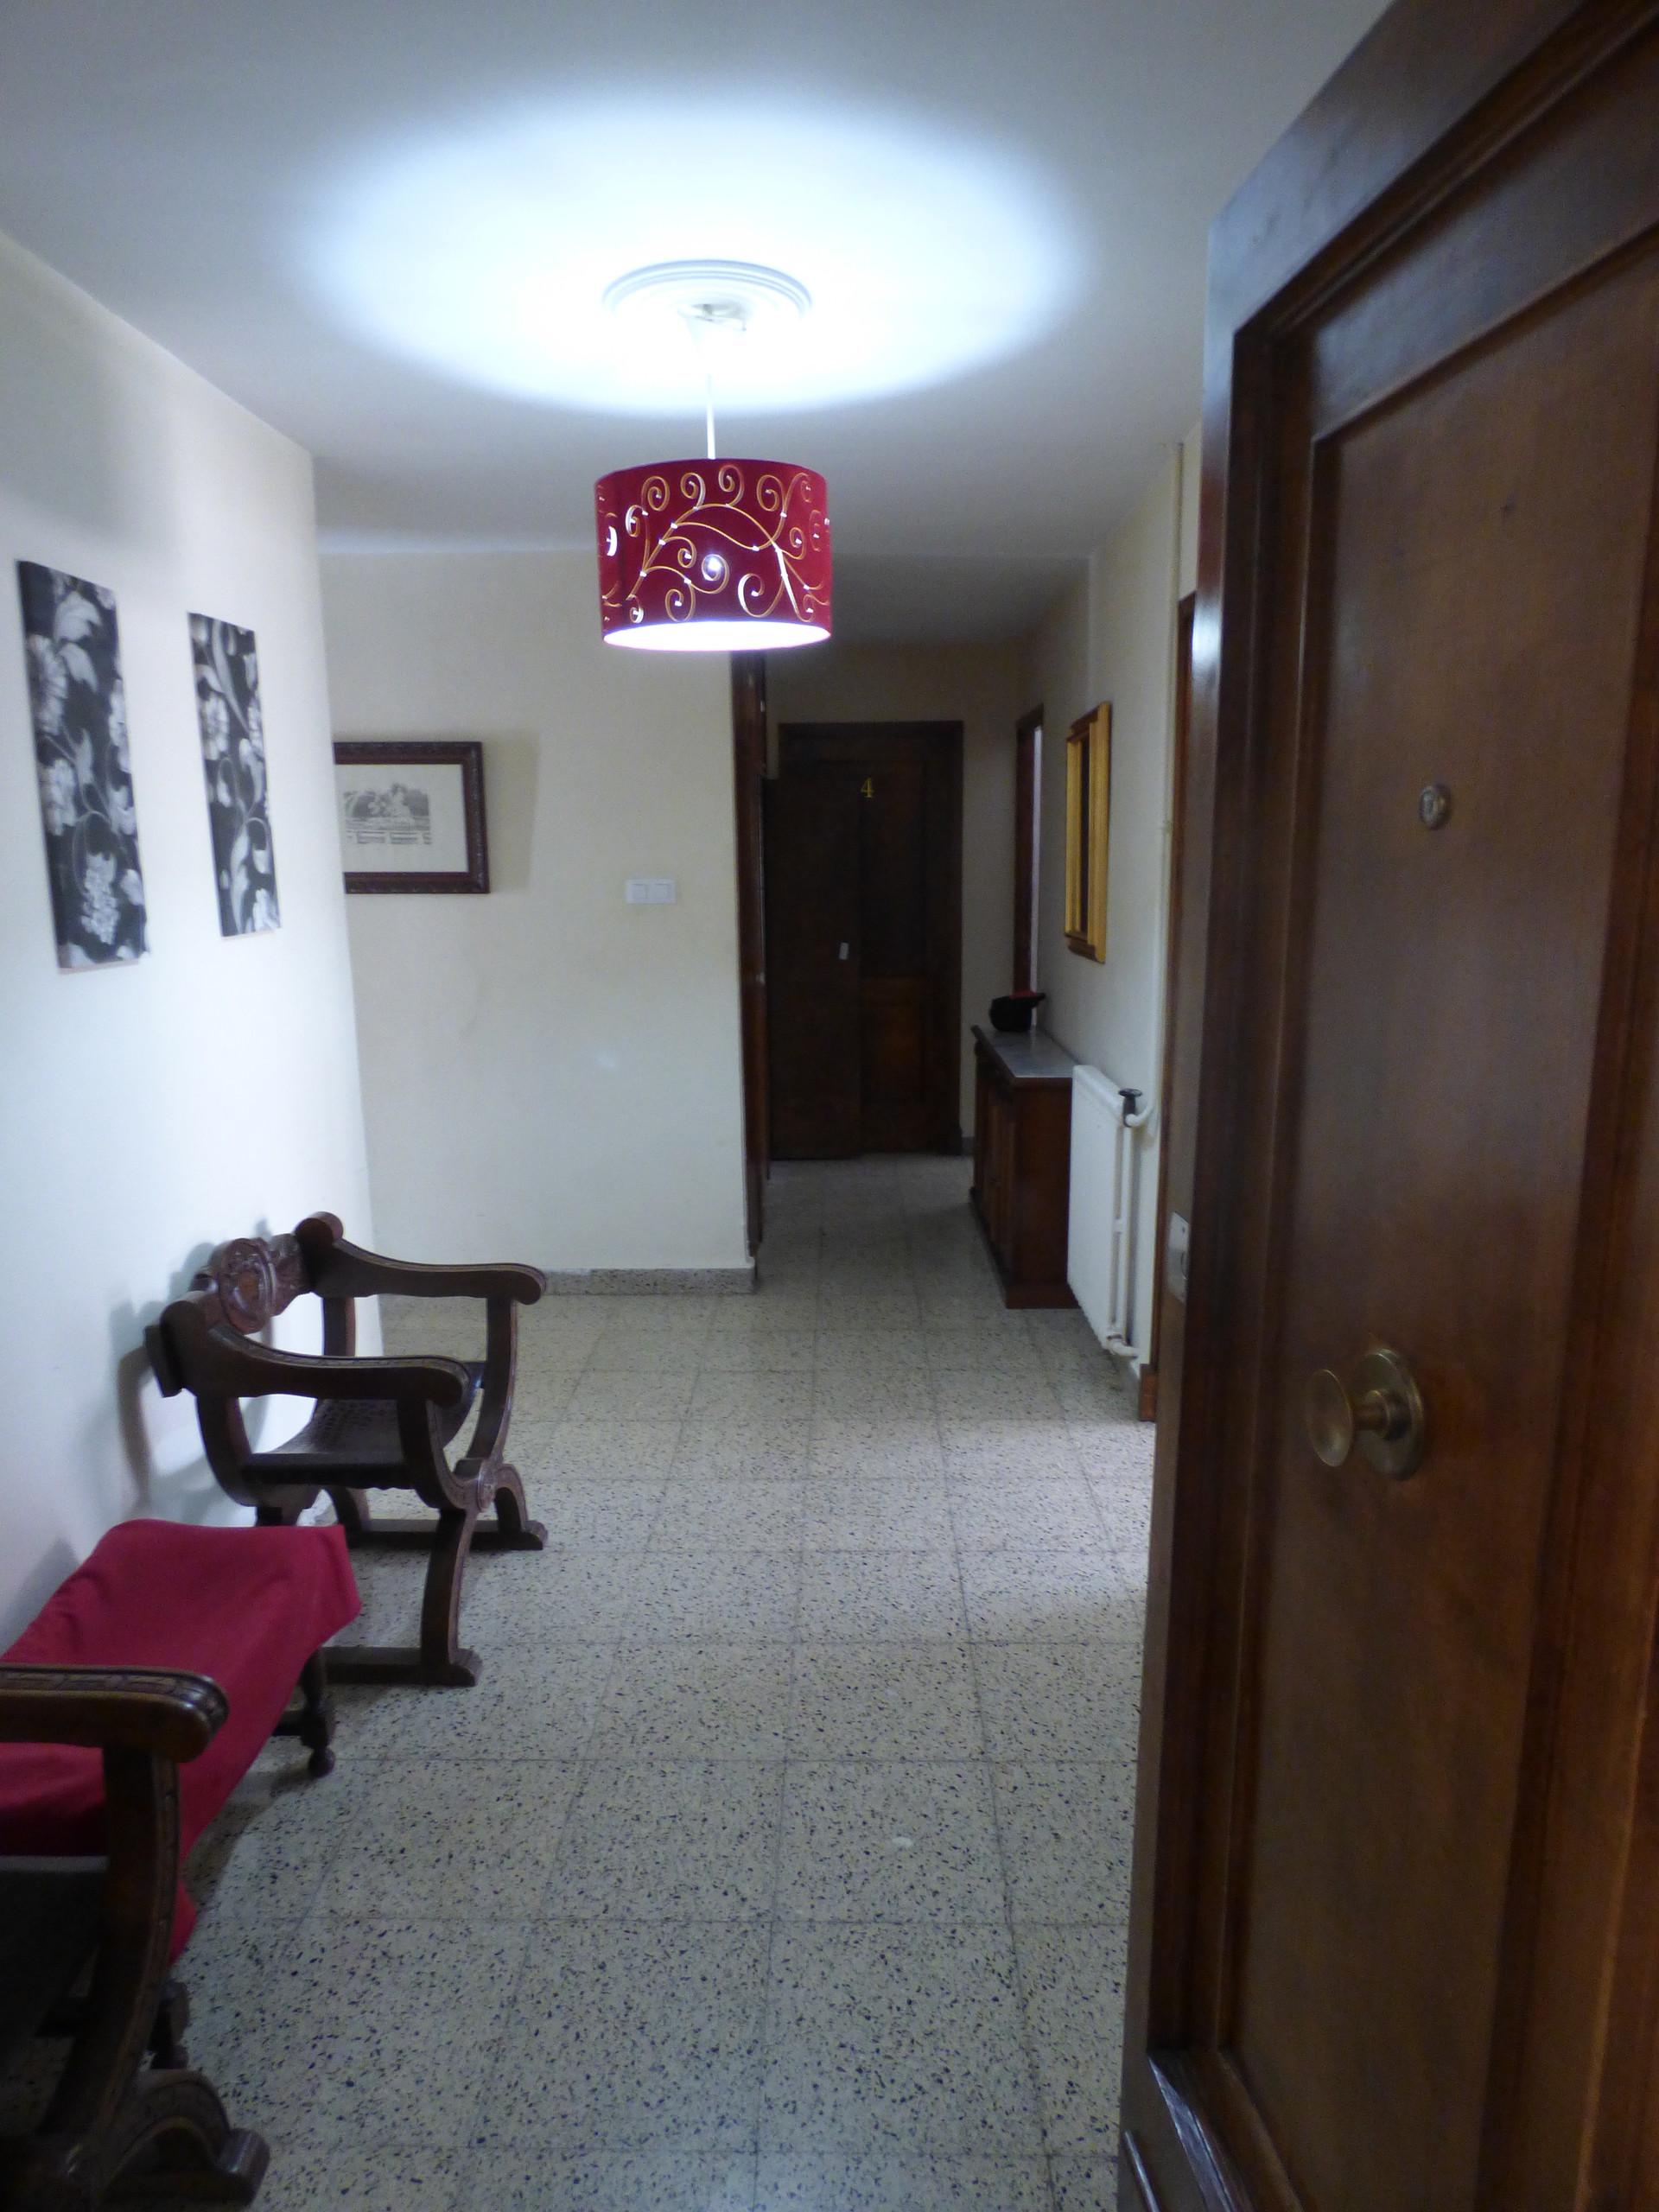 Cef373 excelente piso reformado en ourense room for rent ourense - Ourense piso ...